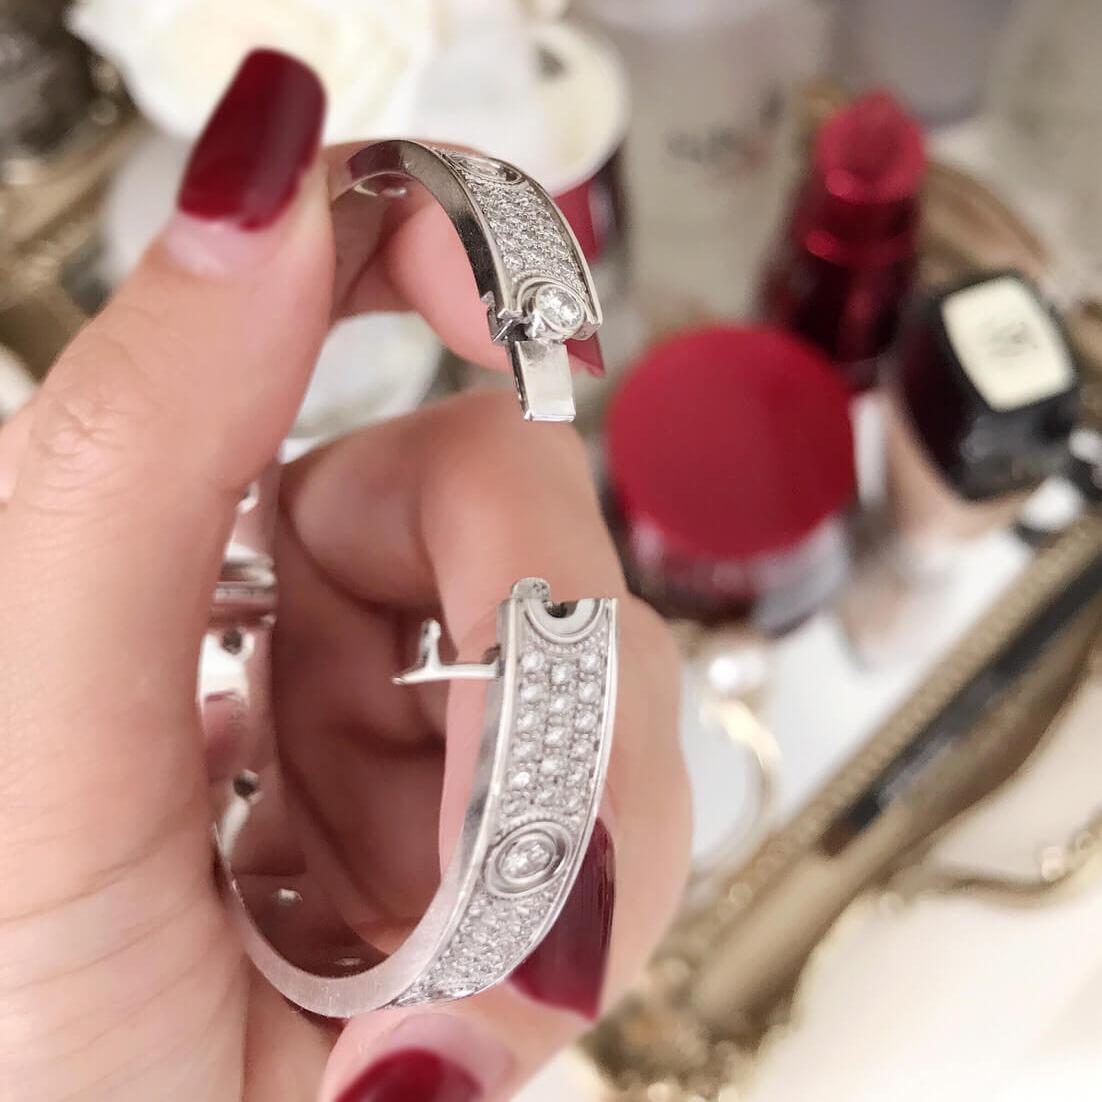 Imitation Cartier Love Bracelet with diamonds